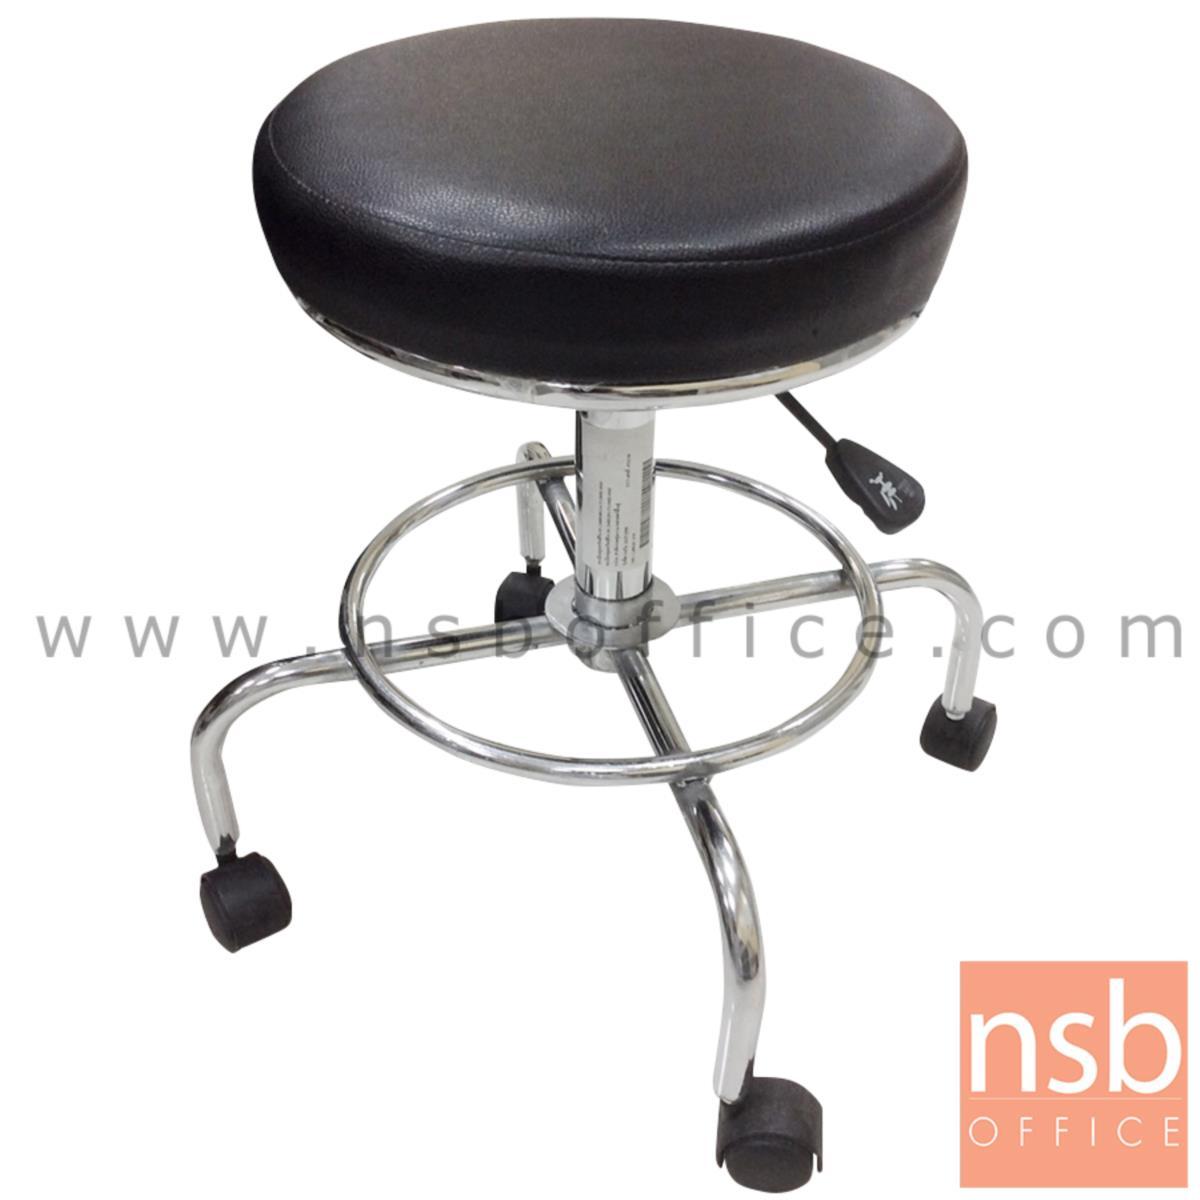 B09A103:เก้าอี้บาร์สตูลที่นั่งกลมล้อเลื่อน รุ่น Zola (โซล่า)  โช๊คแก๊ส ขาเหล็กชุบโครเมี่ยม